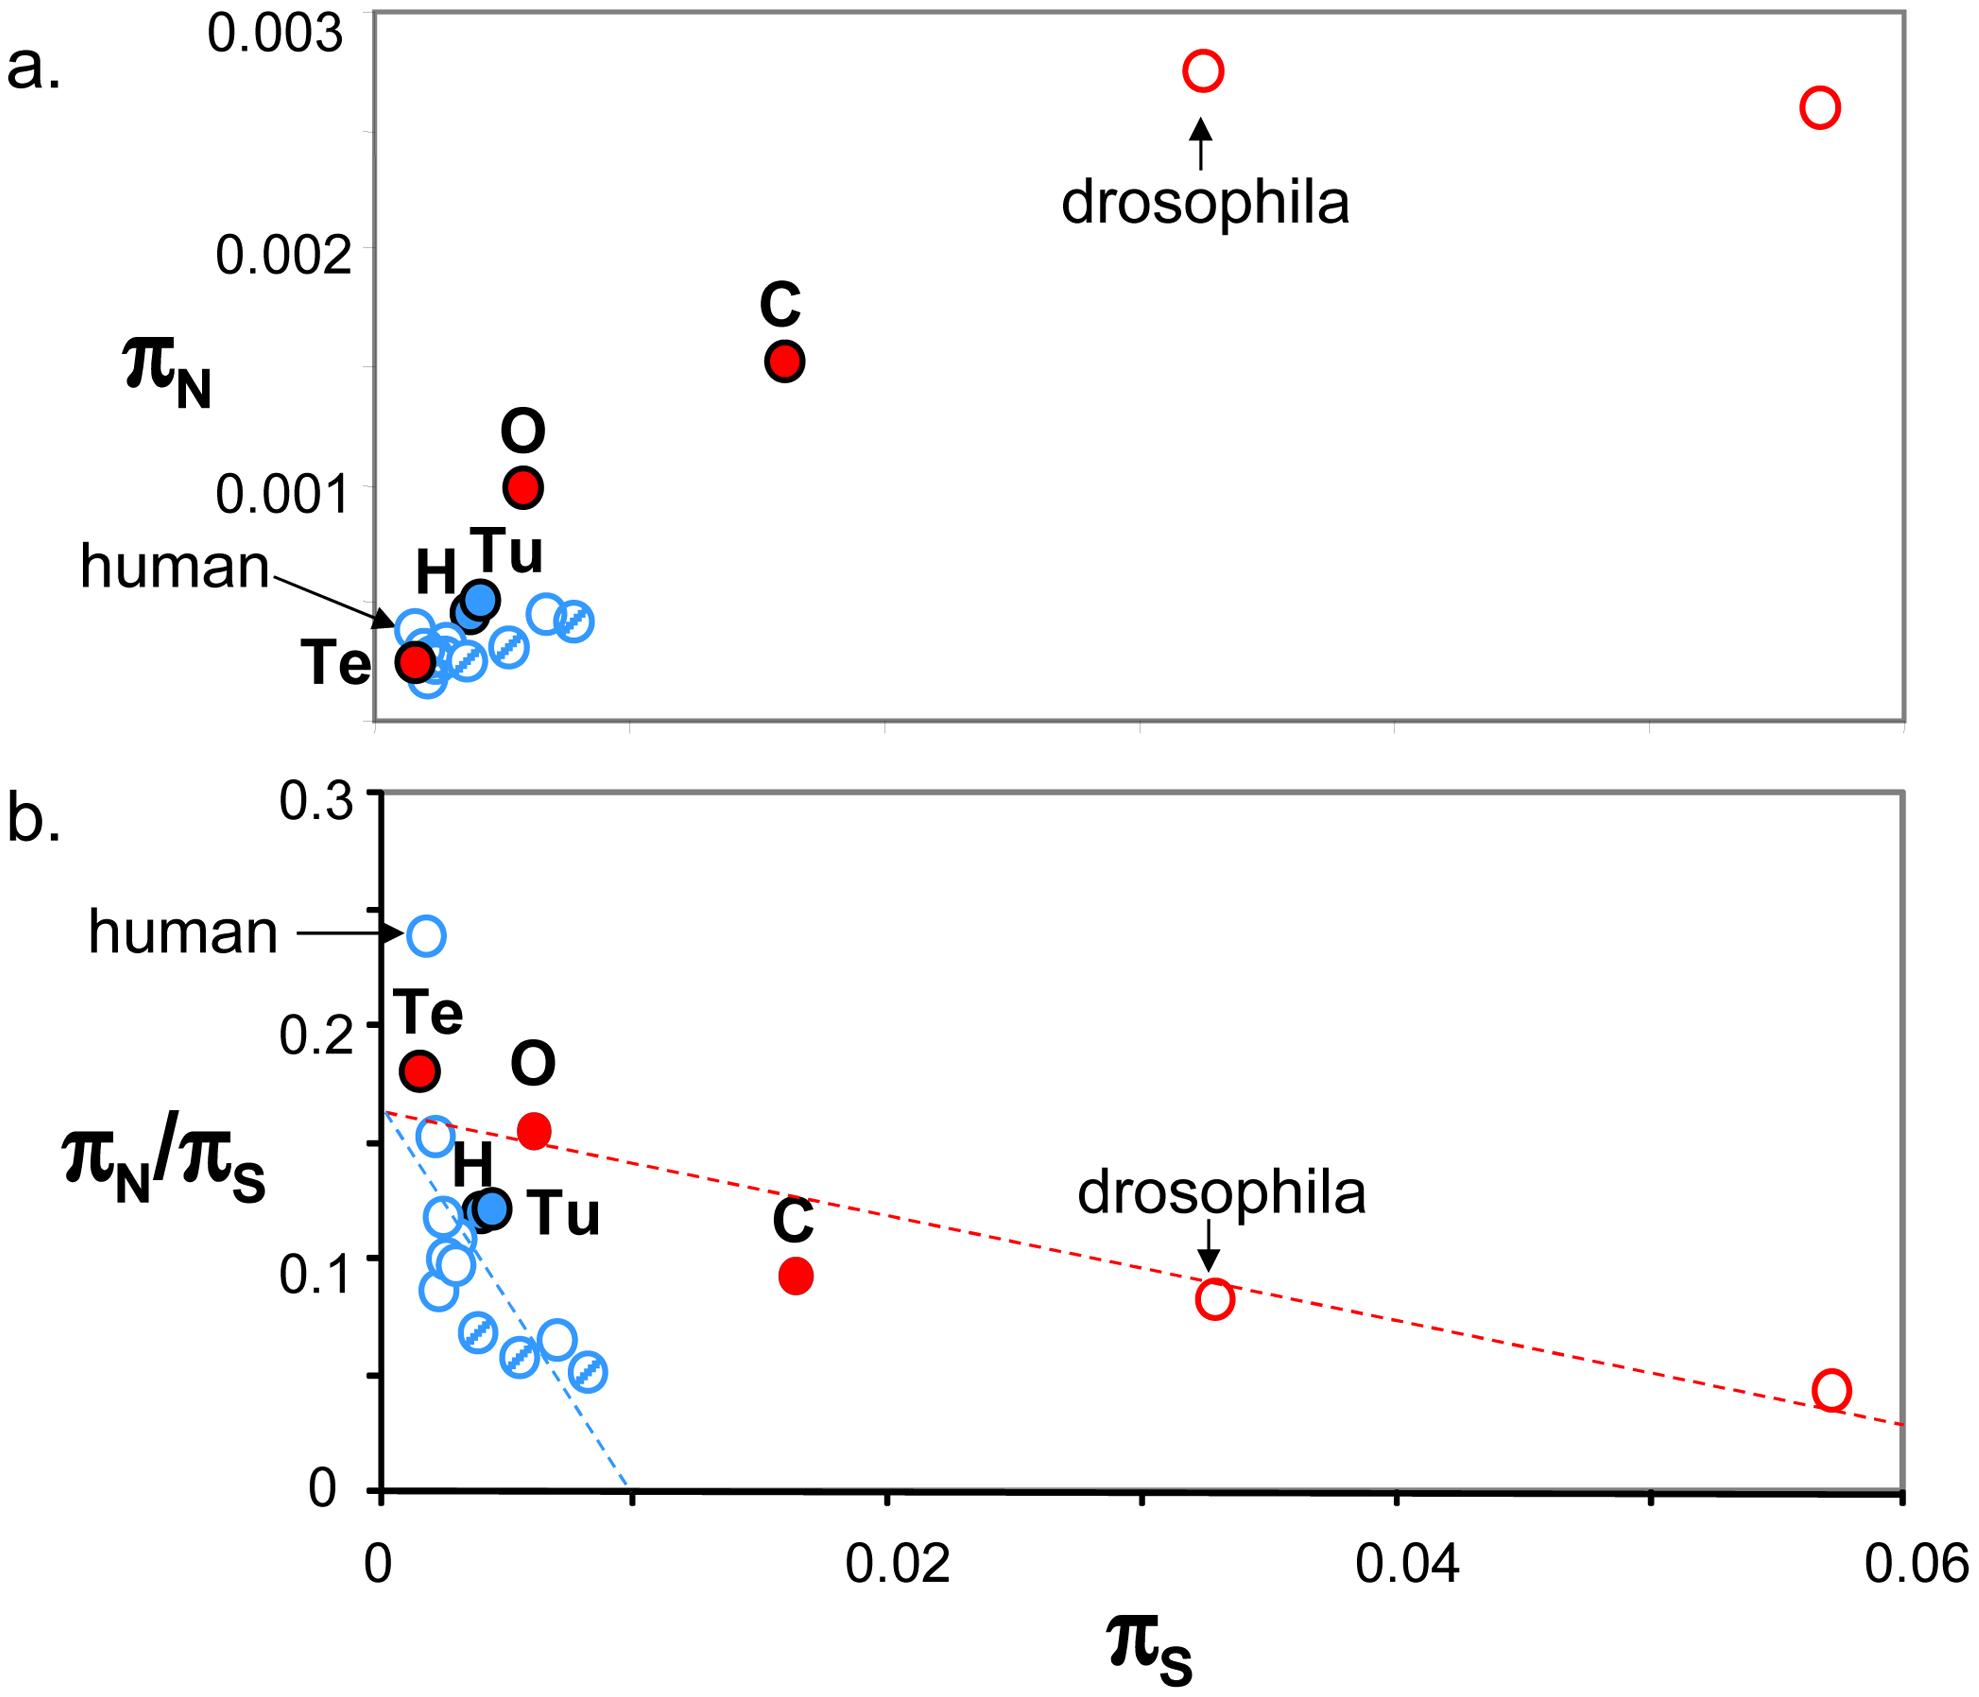 Published estimates of genome-wide π<sub>S</sub>, π<sub>N</sub> and π<sub>N</sub>/π<sub>S</sub> in animals.